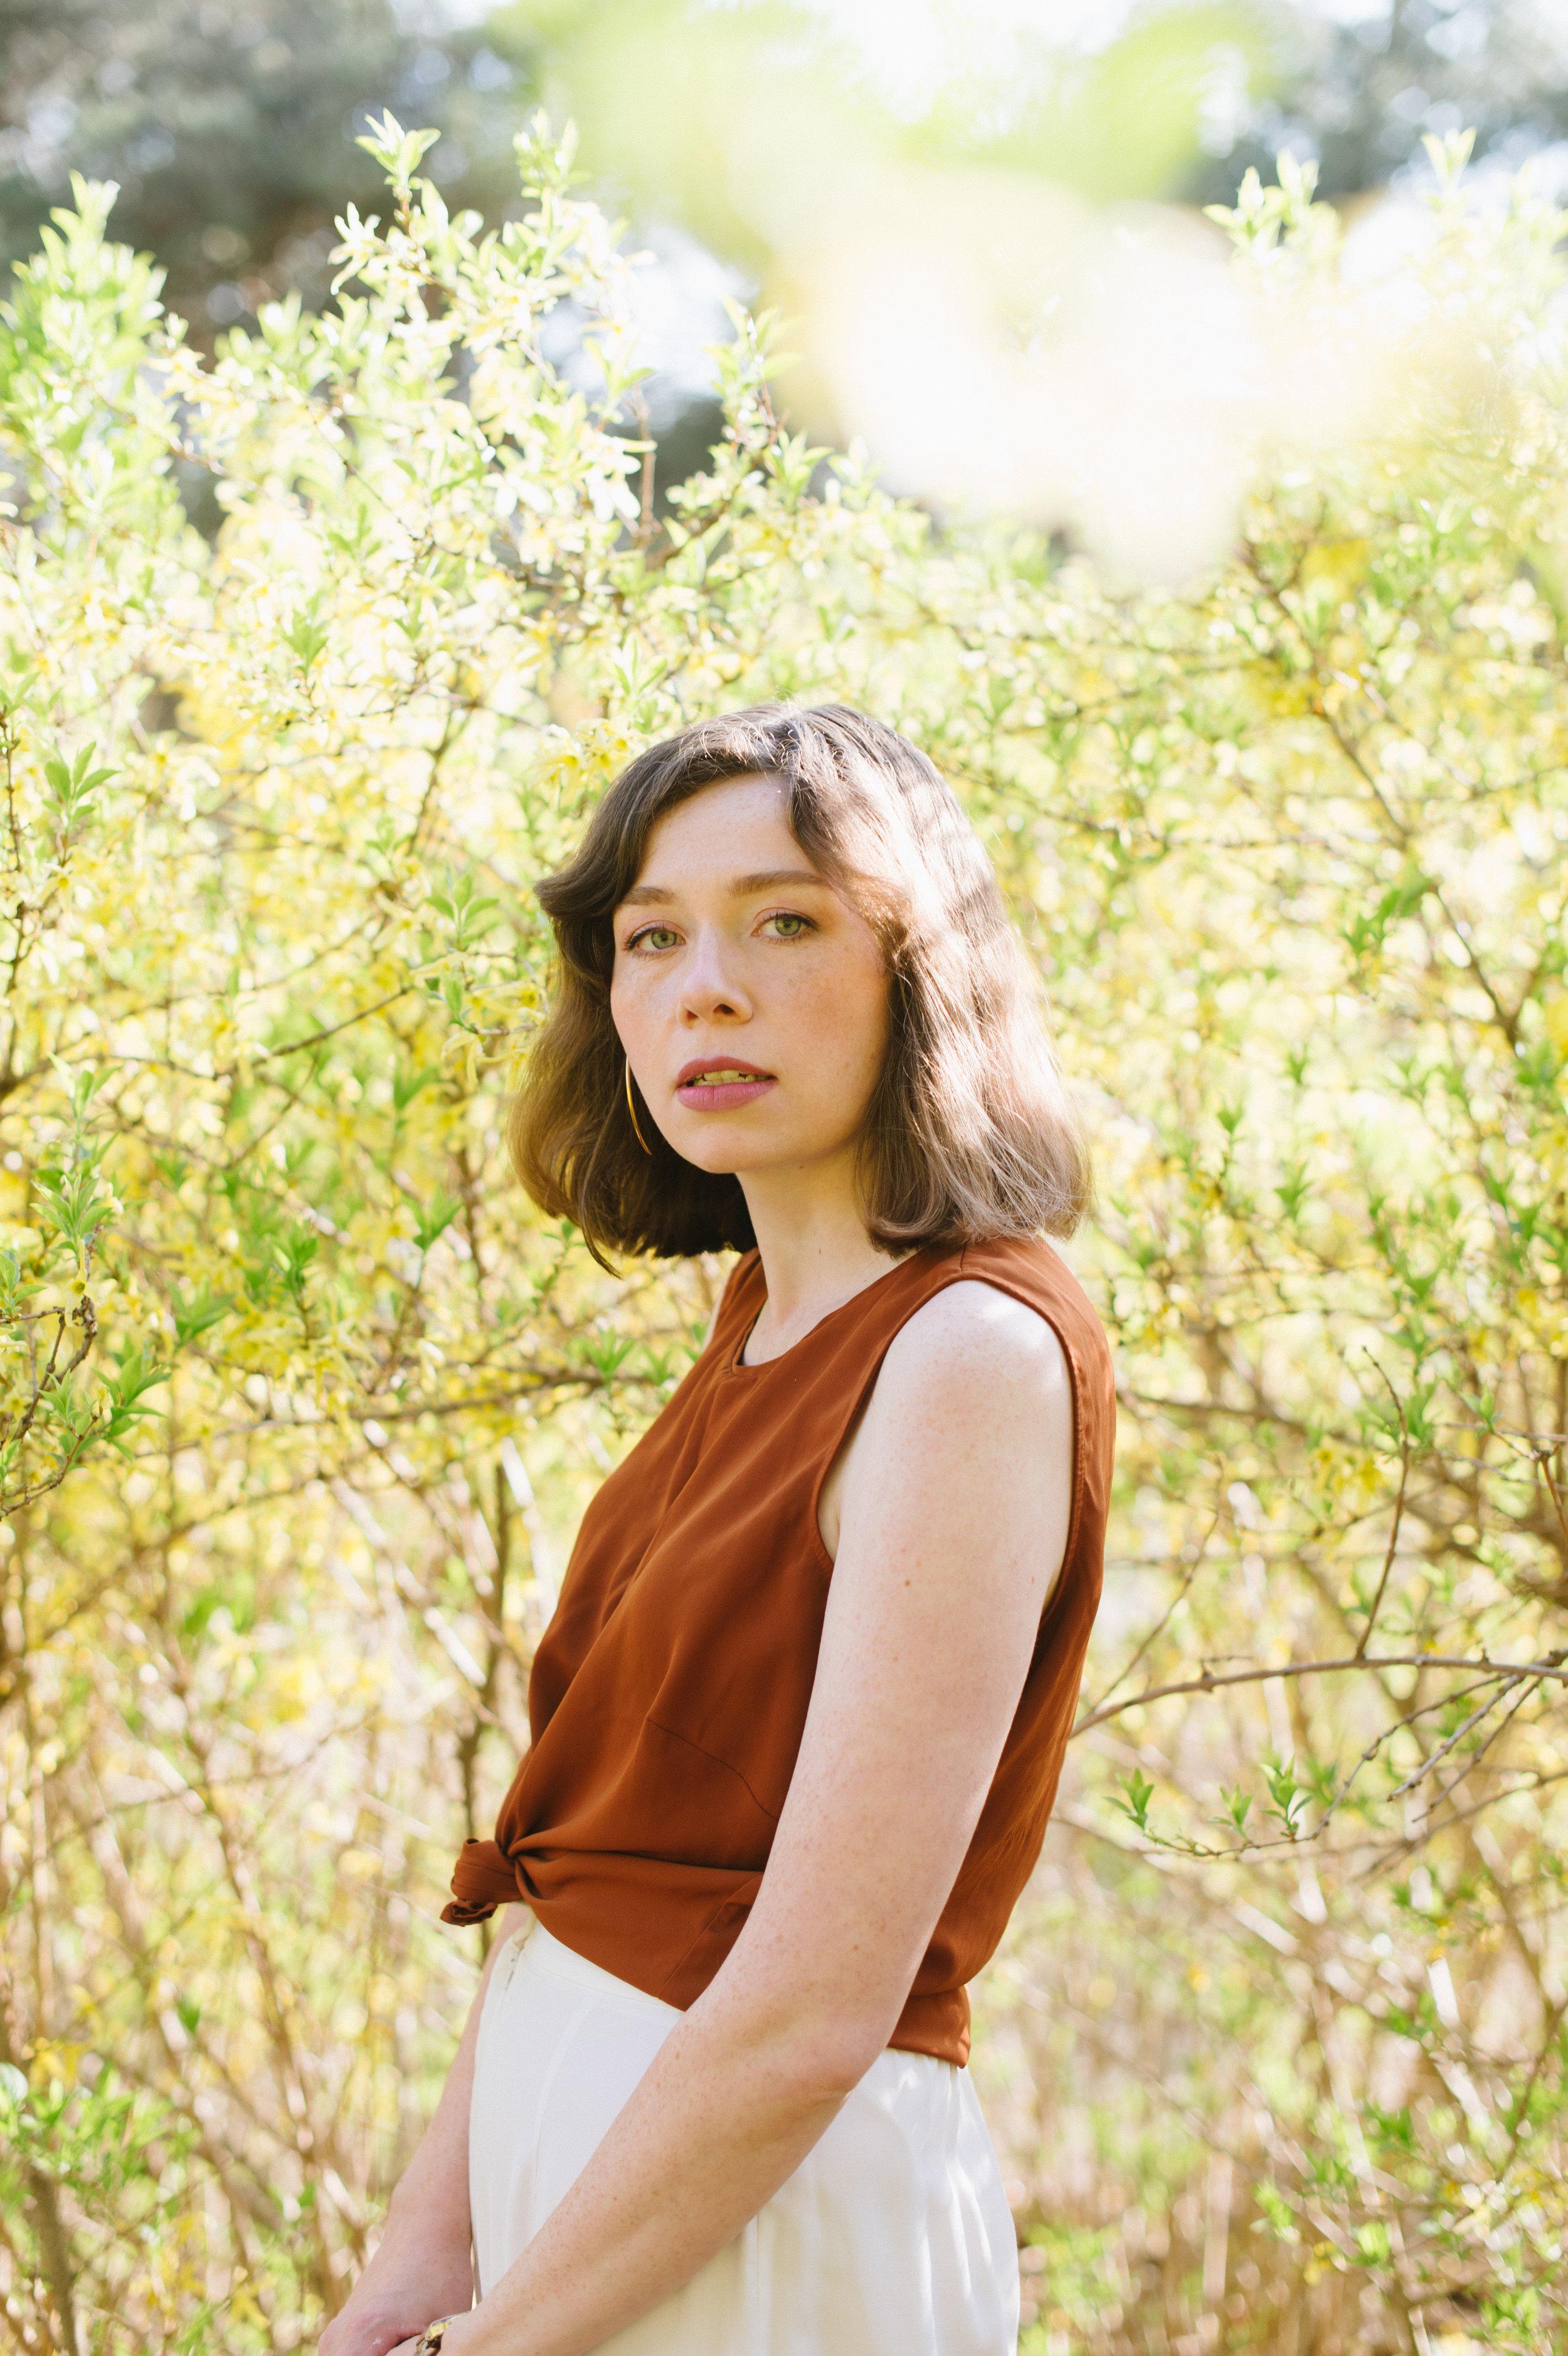 Celine-kim-photography-toronto-portrait-photographer-louise-reimer-4.jpg